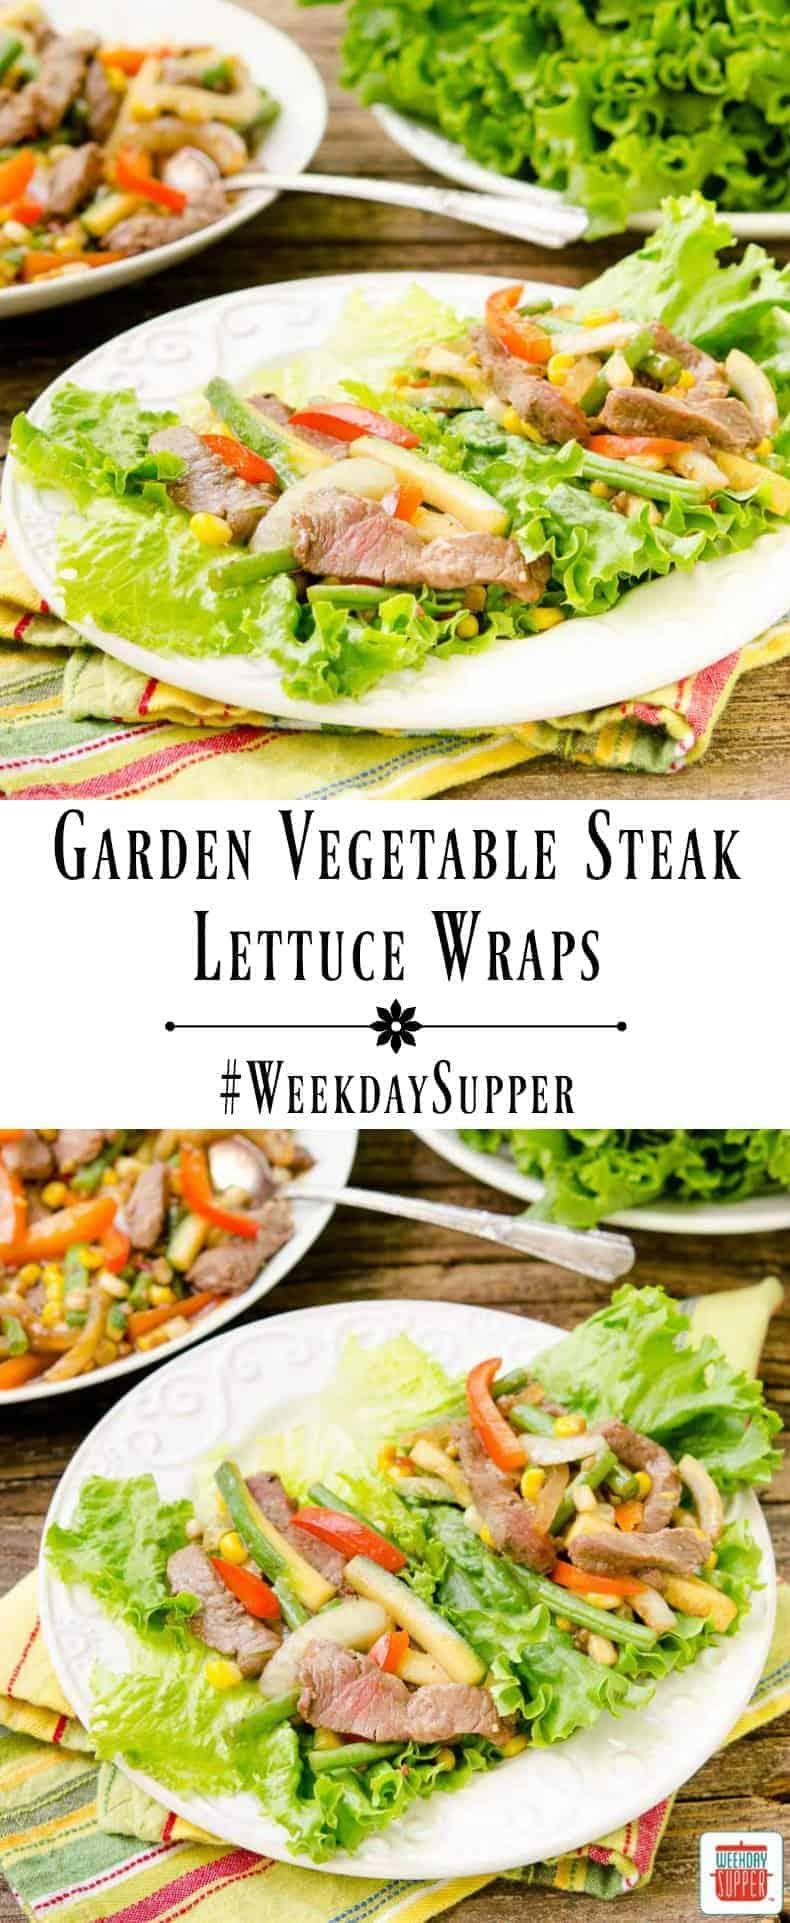 Garden Vegetable Steak Lettuce Wraps #WeekdaySupper ...